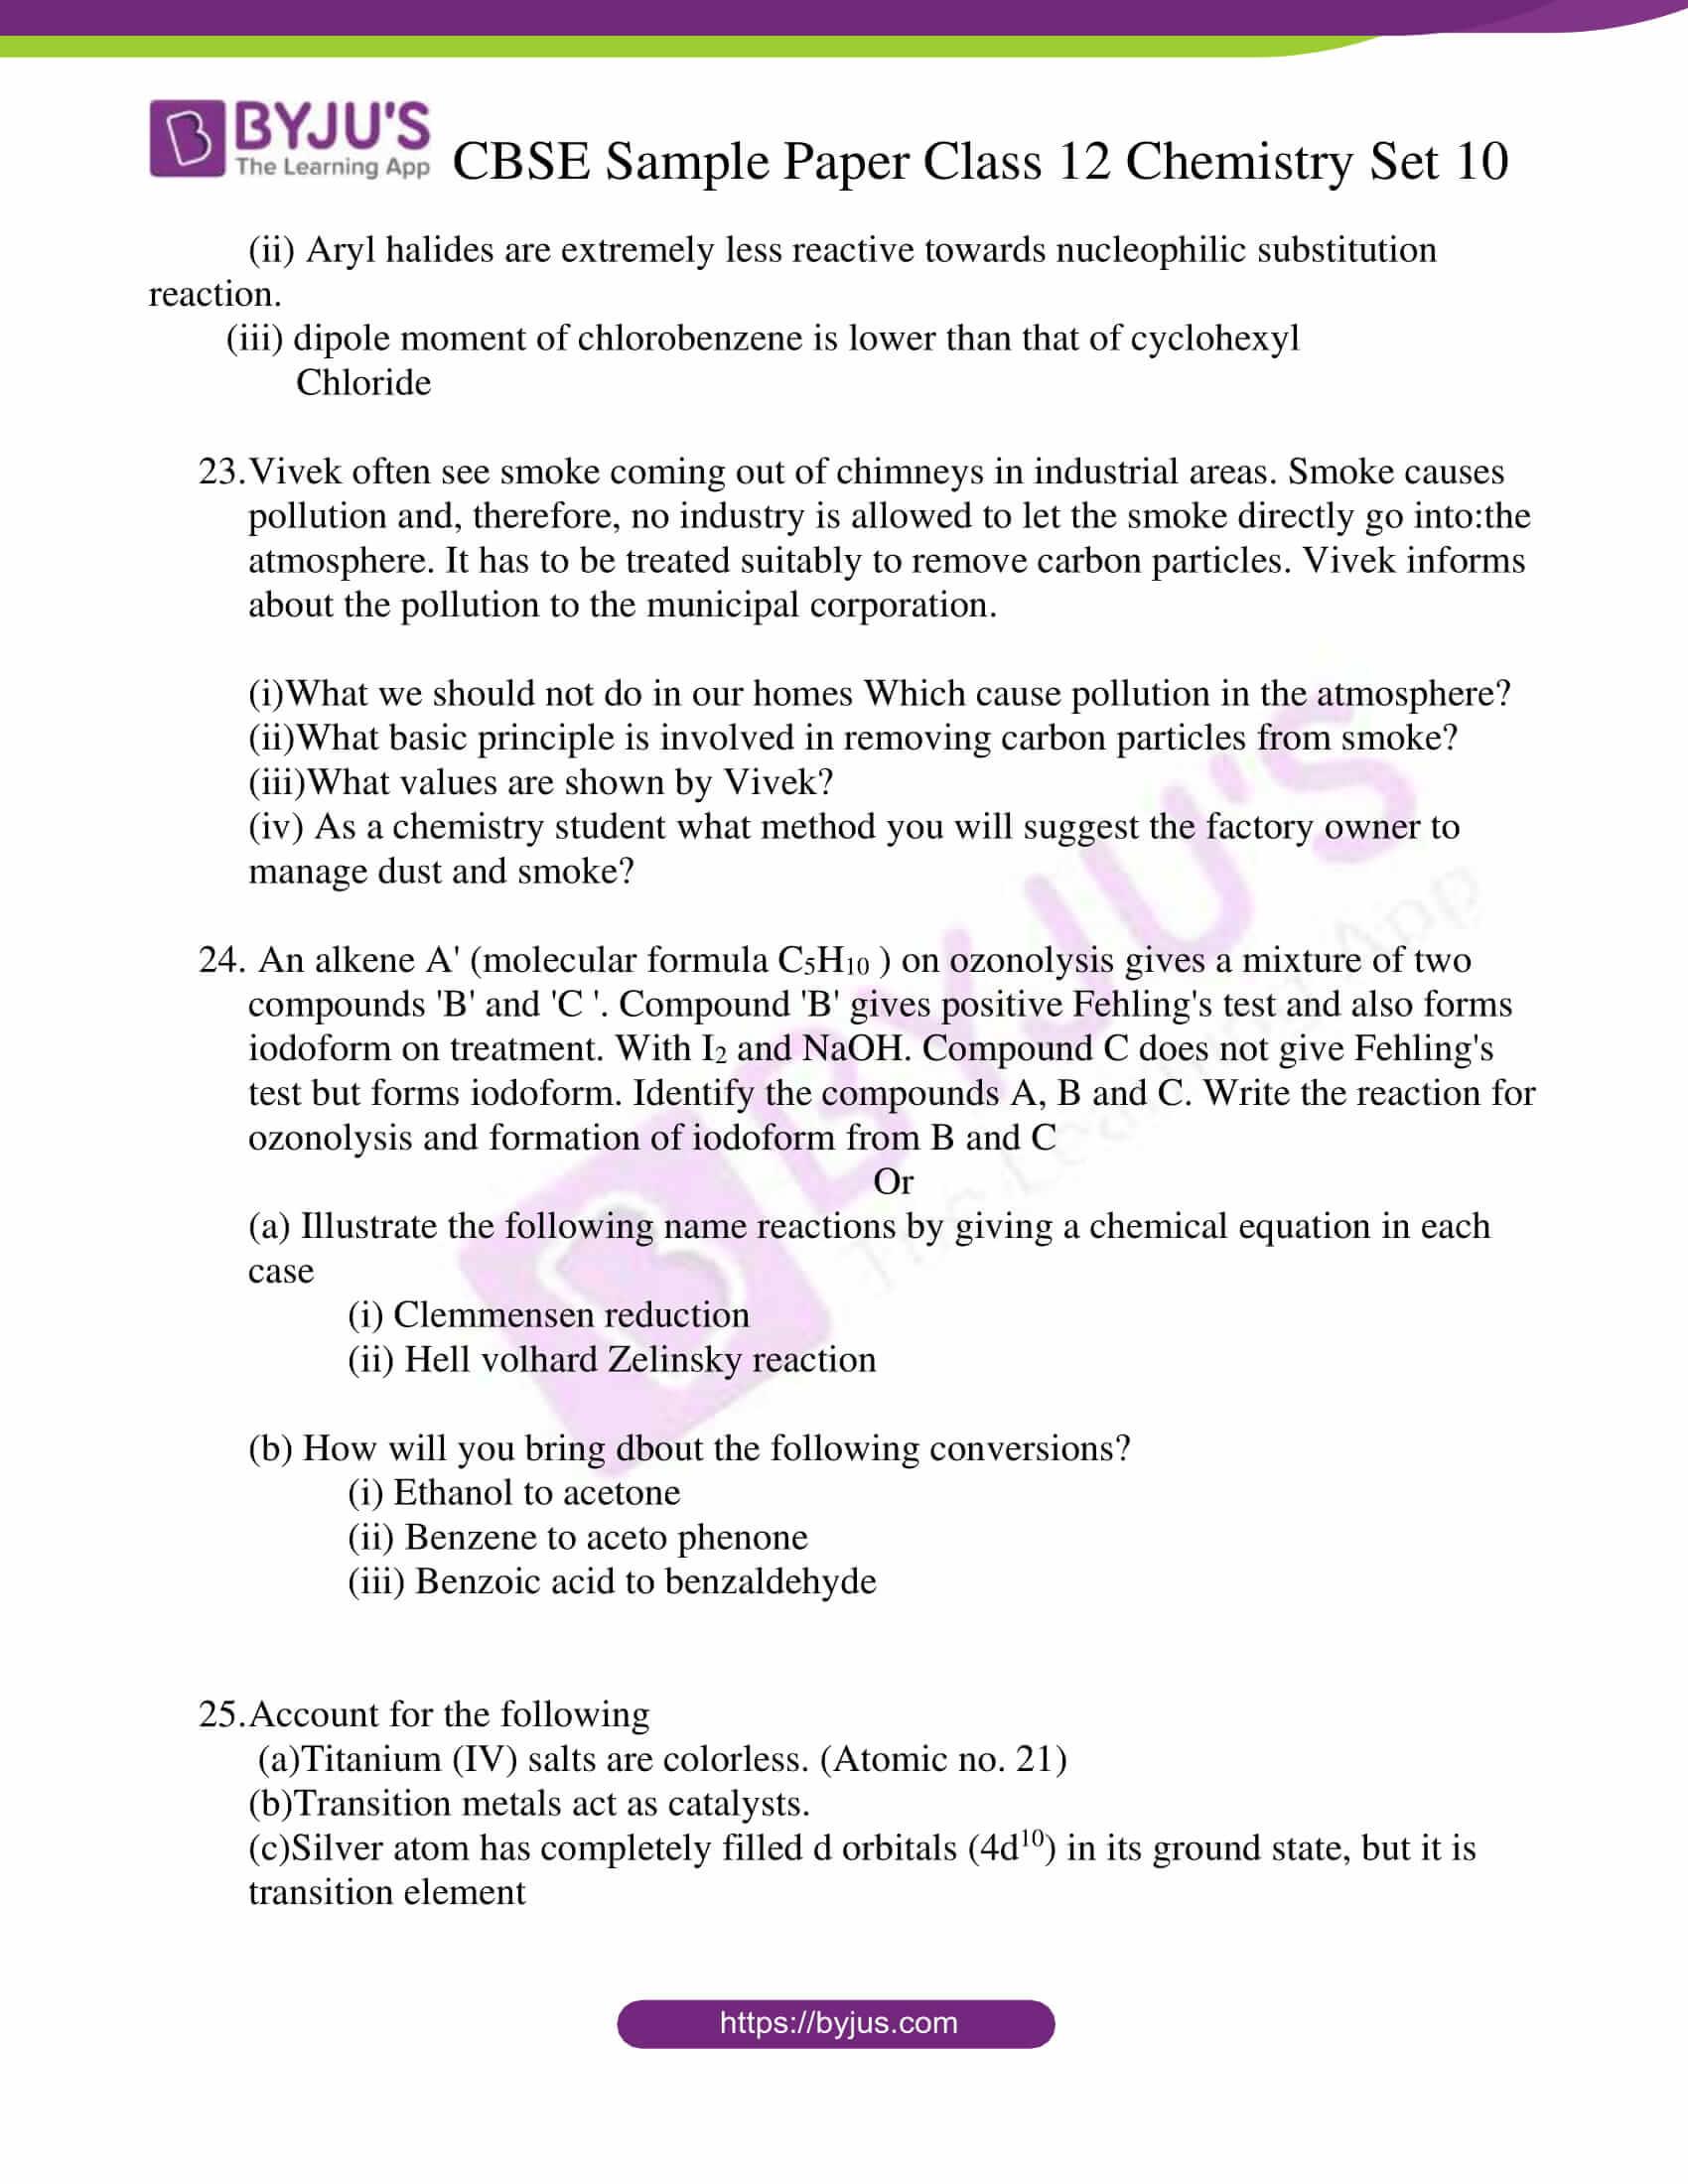 cbse sample paper class 12 chemistry set 10